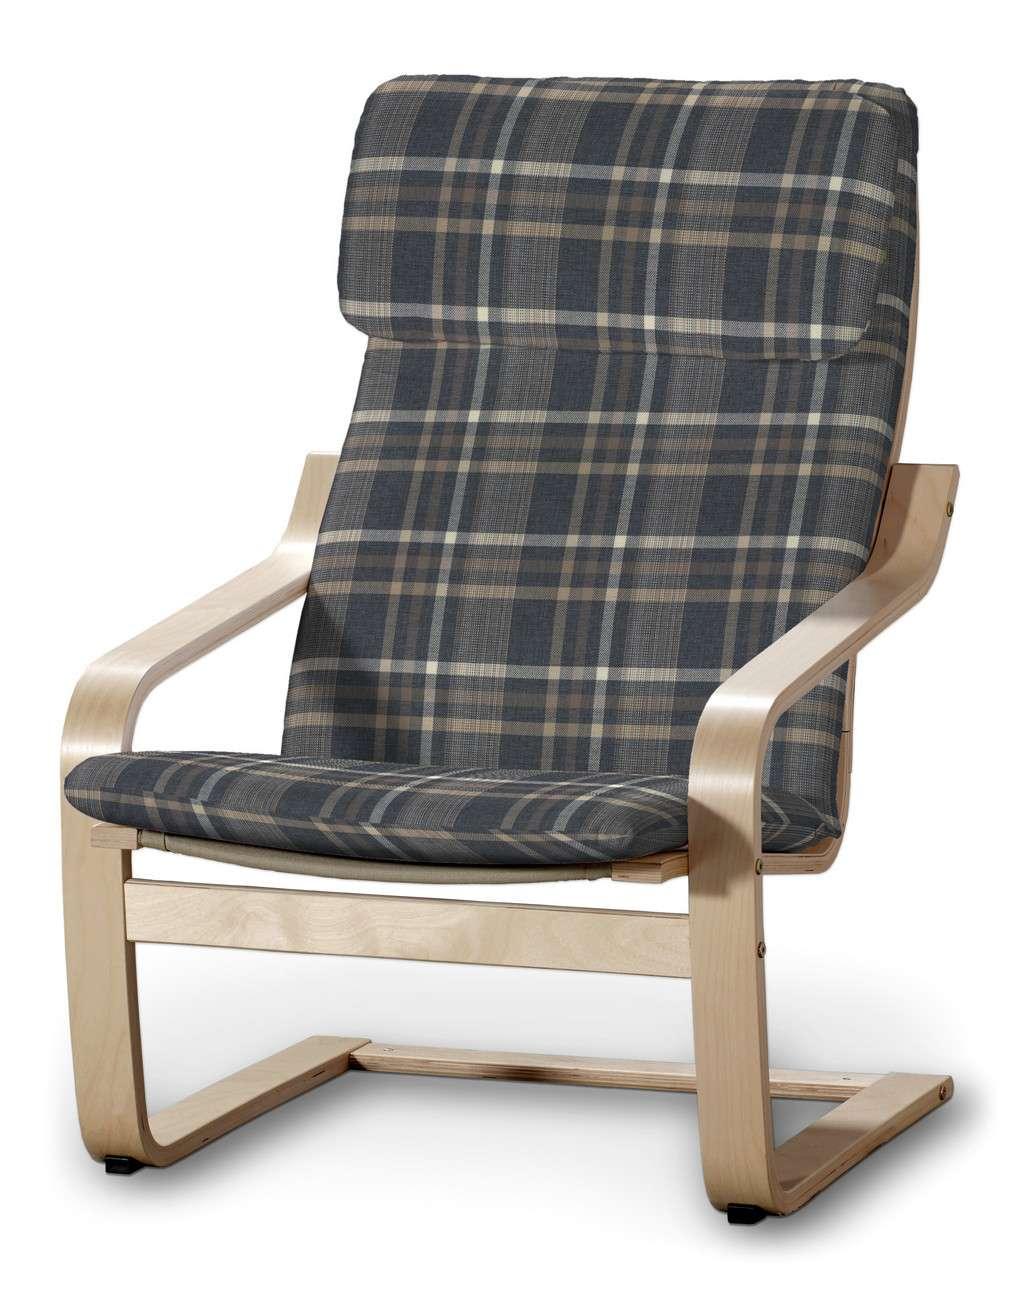 Poduszka na fotel Poäng w kolekcji Edinburgh, tkanina: 703-16